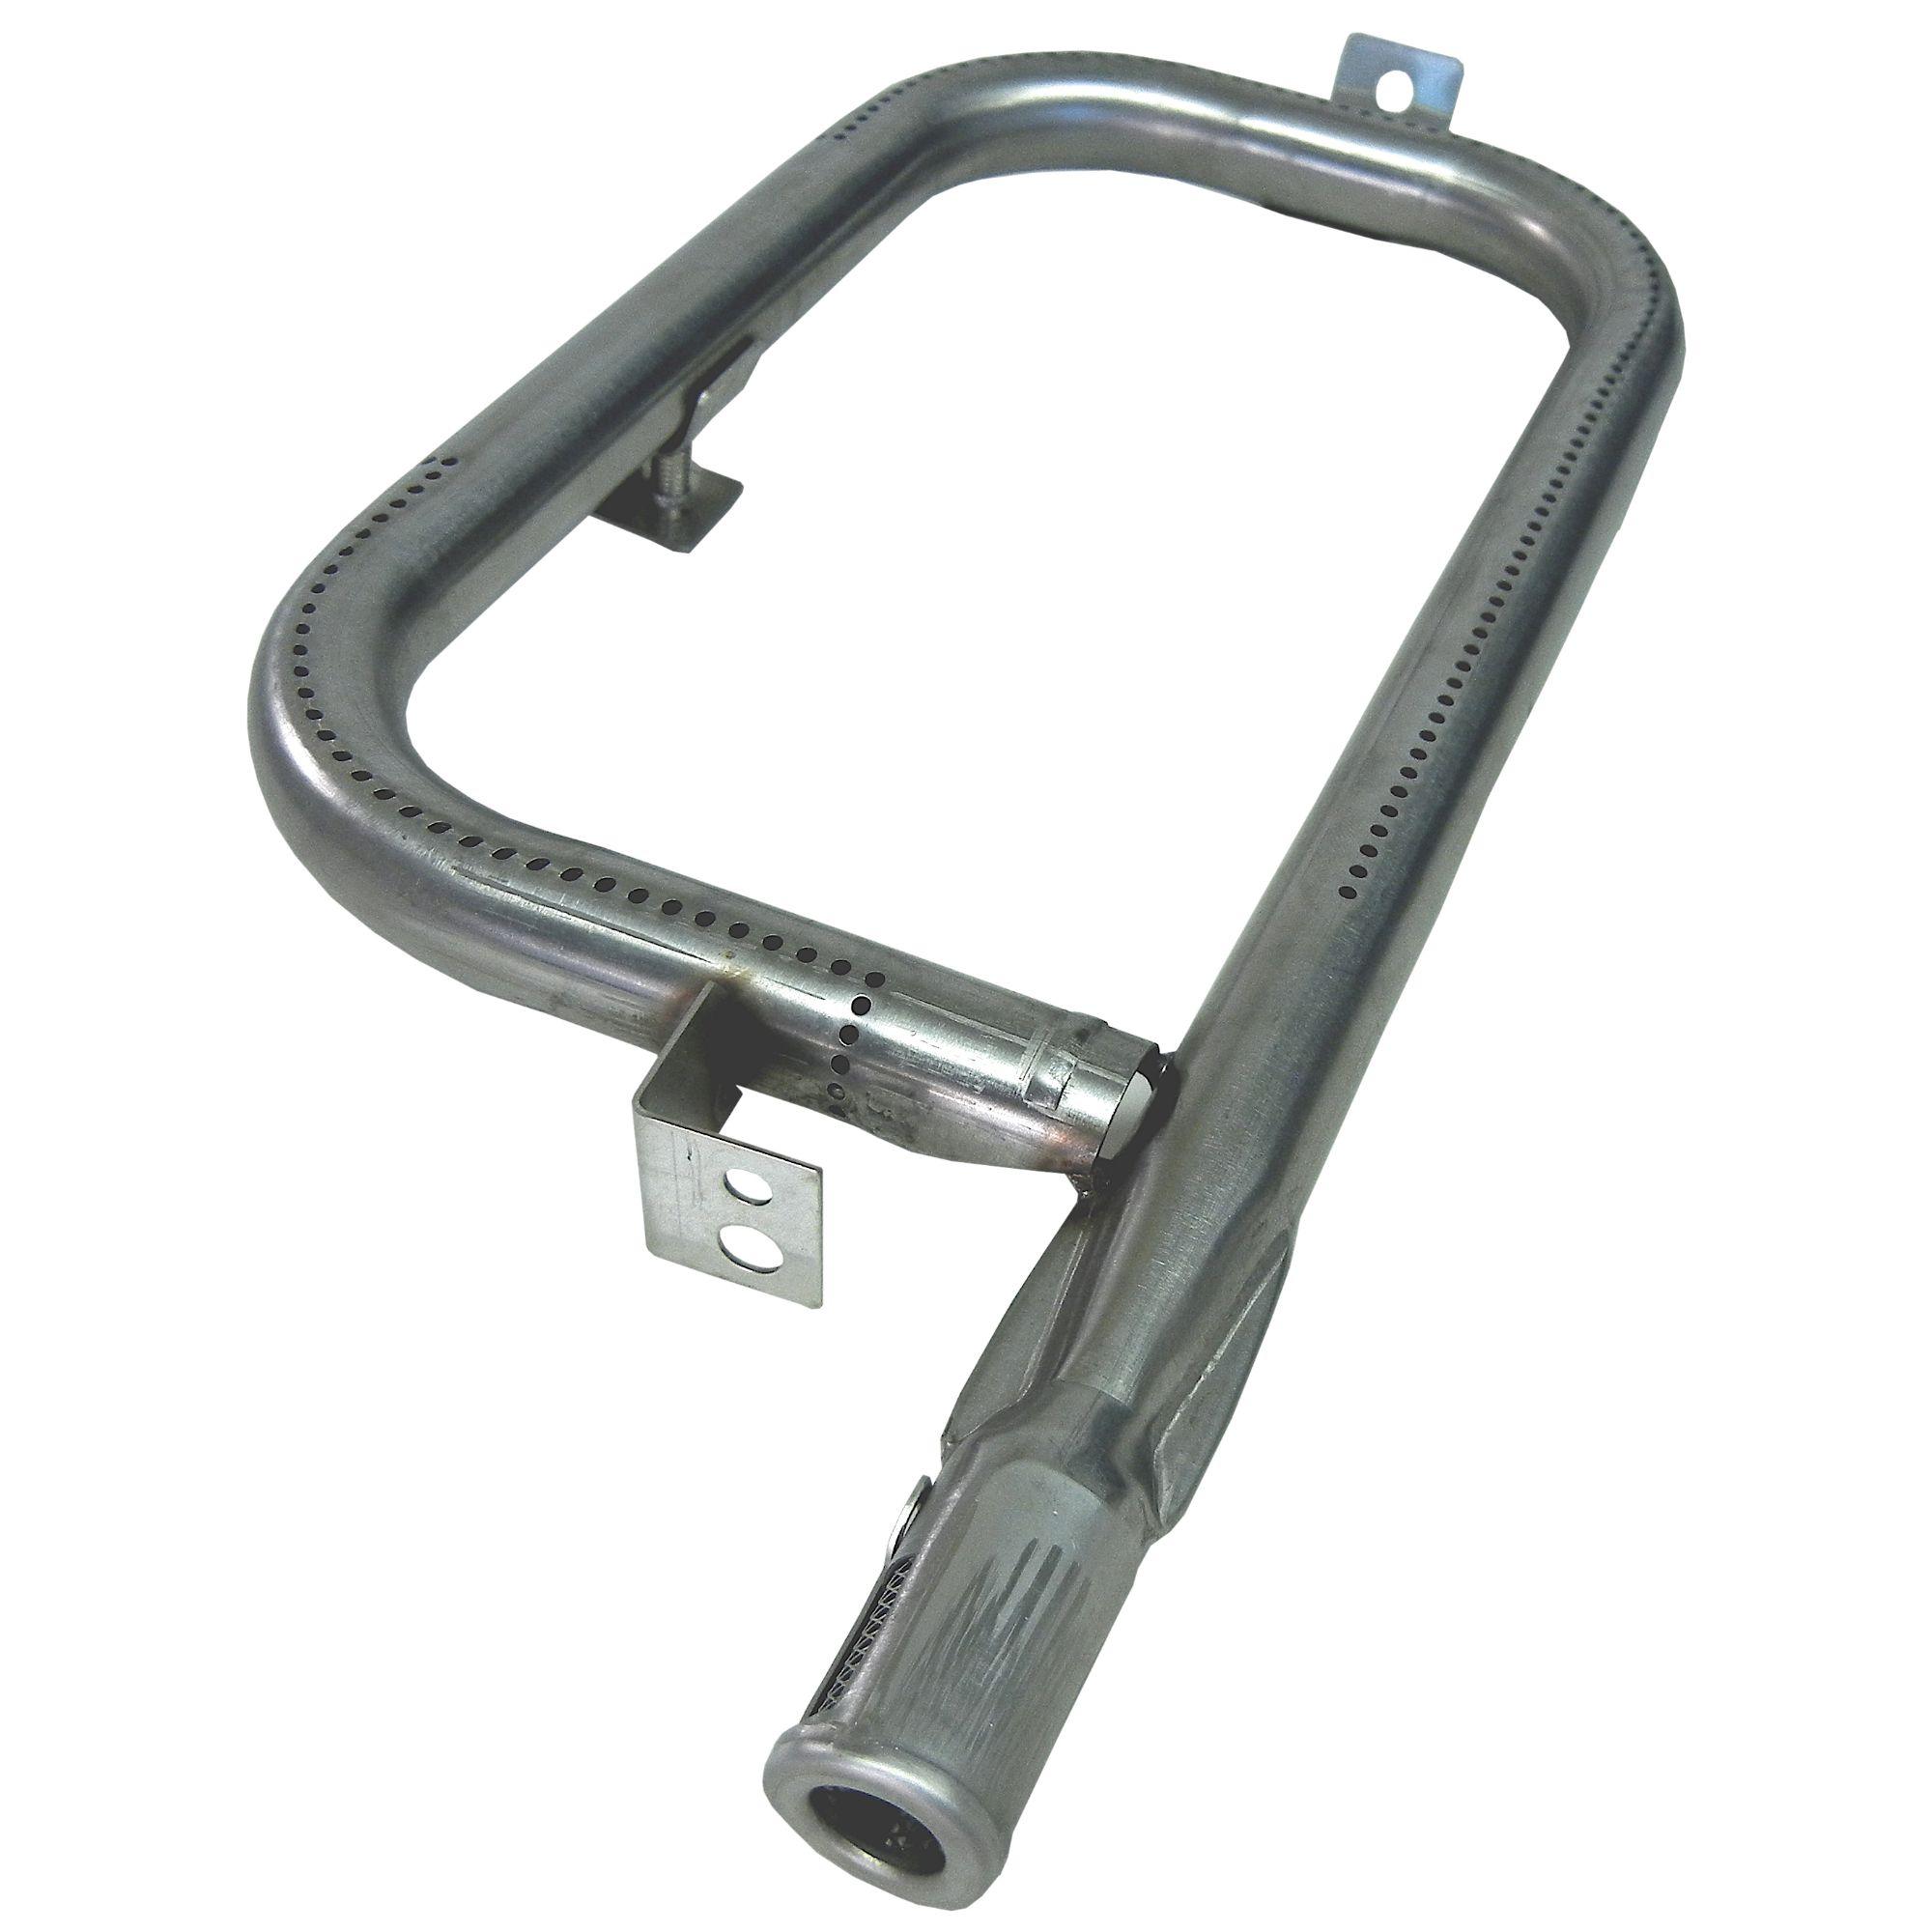 "stainless steel burner; Backyard Grill,Uniflame; 13.75"" x 5.5"""